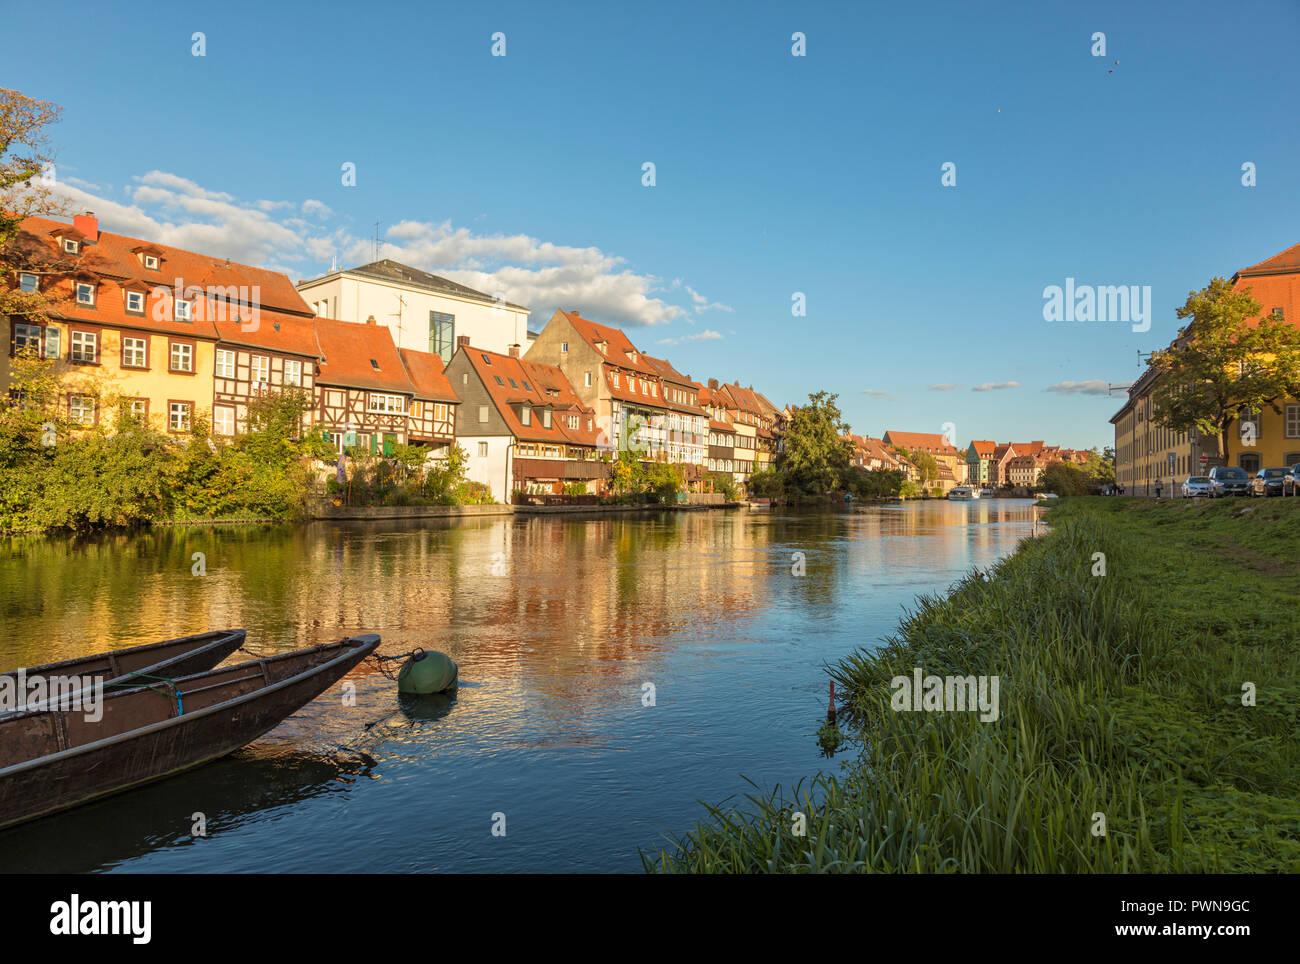 Klein-Venedig (Little Venice), historic quarter on the shore of Regnitz river at Bamberg, Bavaria, Germany - Stock Image